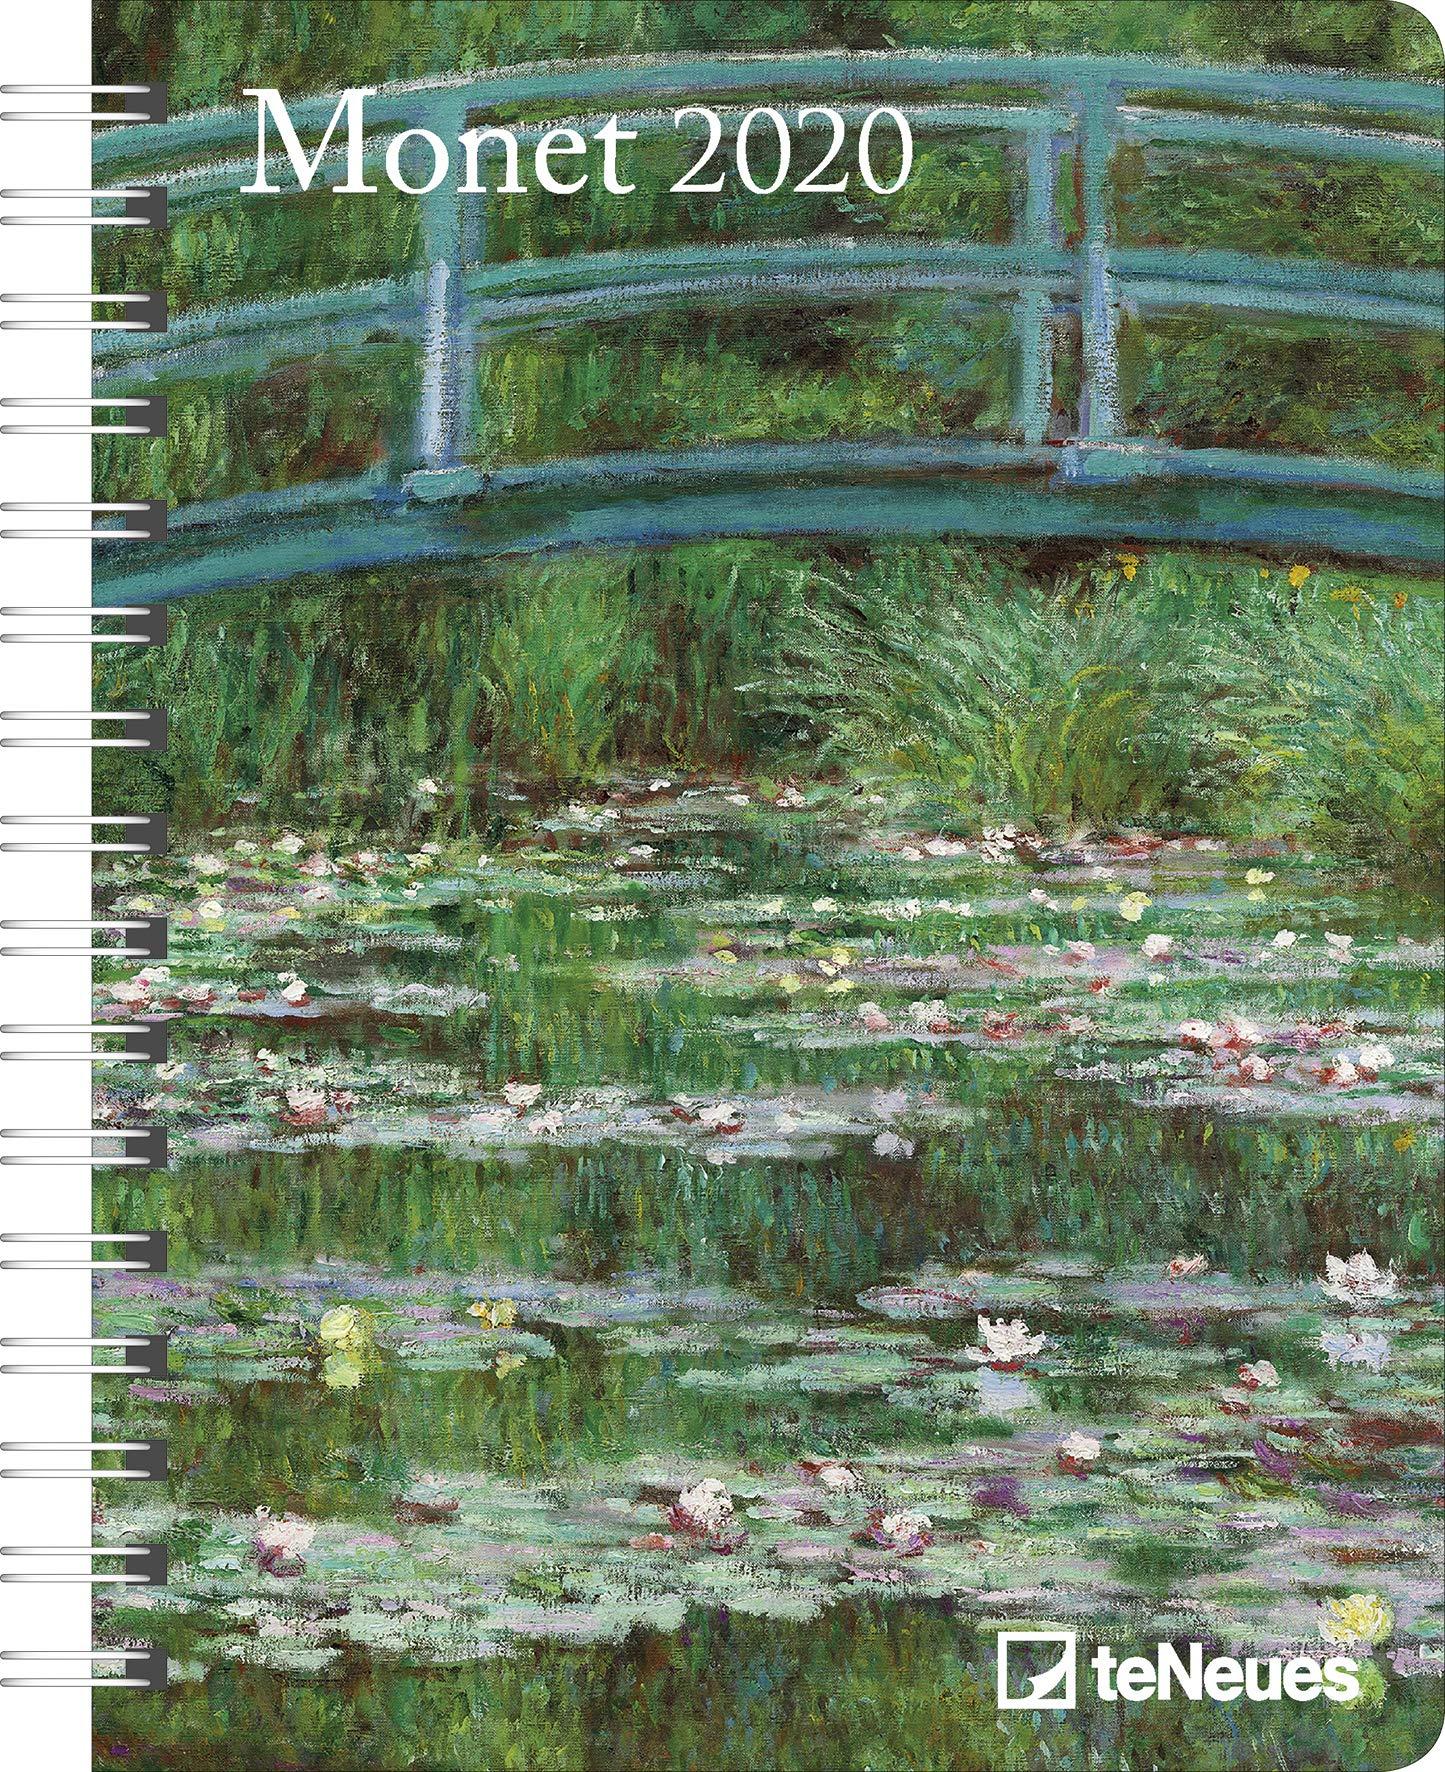 Monet 2020 Buchkalender Deluxe: Amazon.es: Claude Monet: Libros